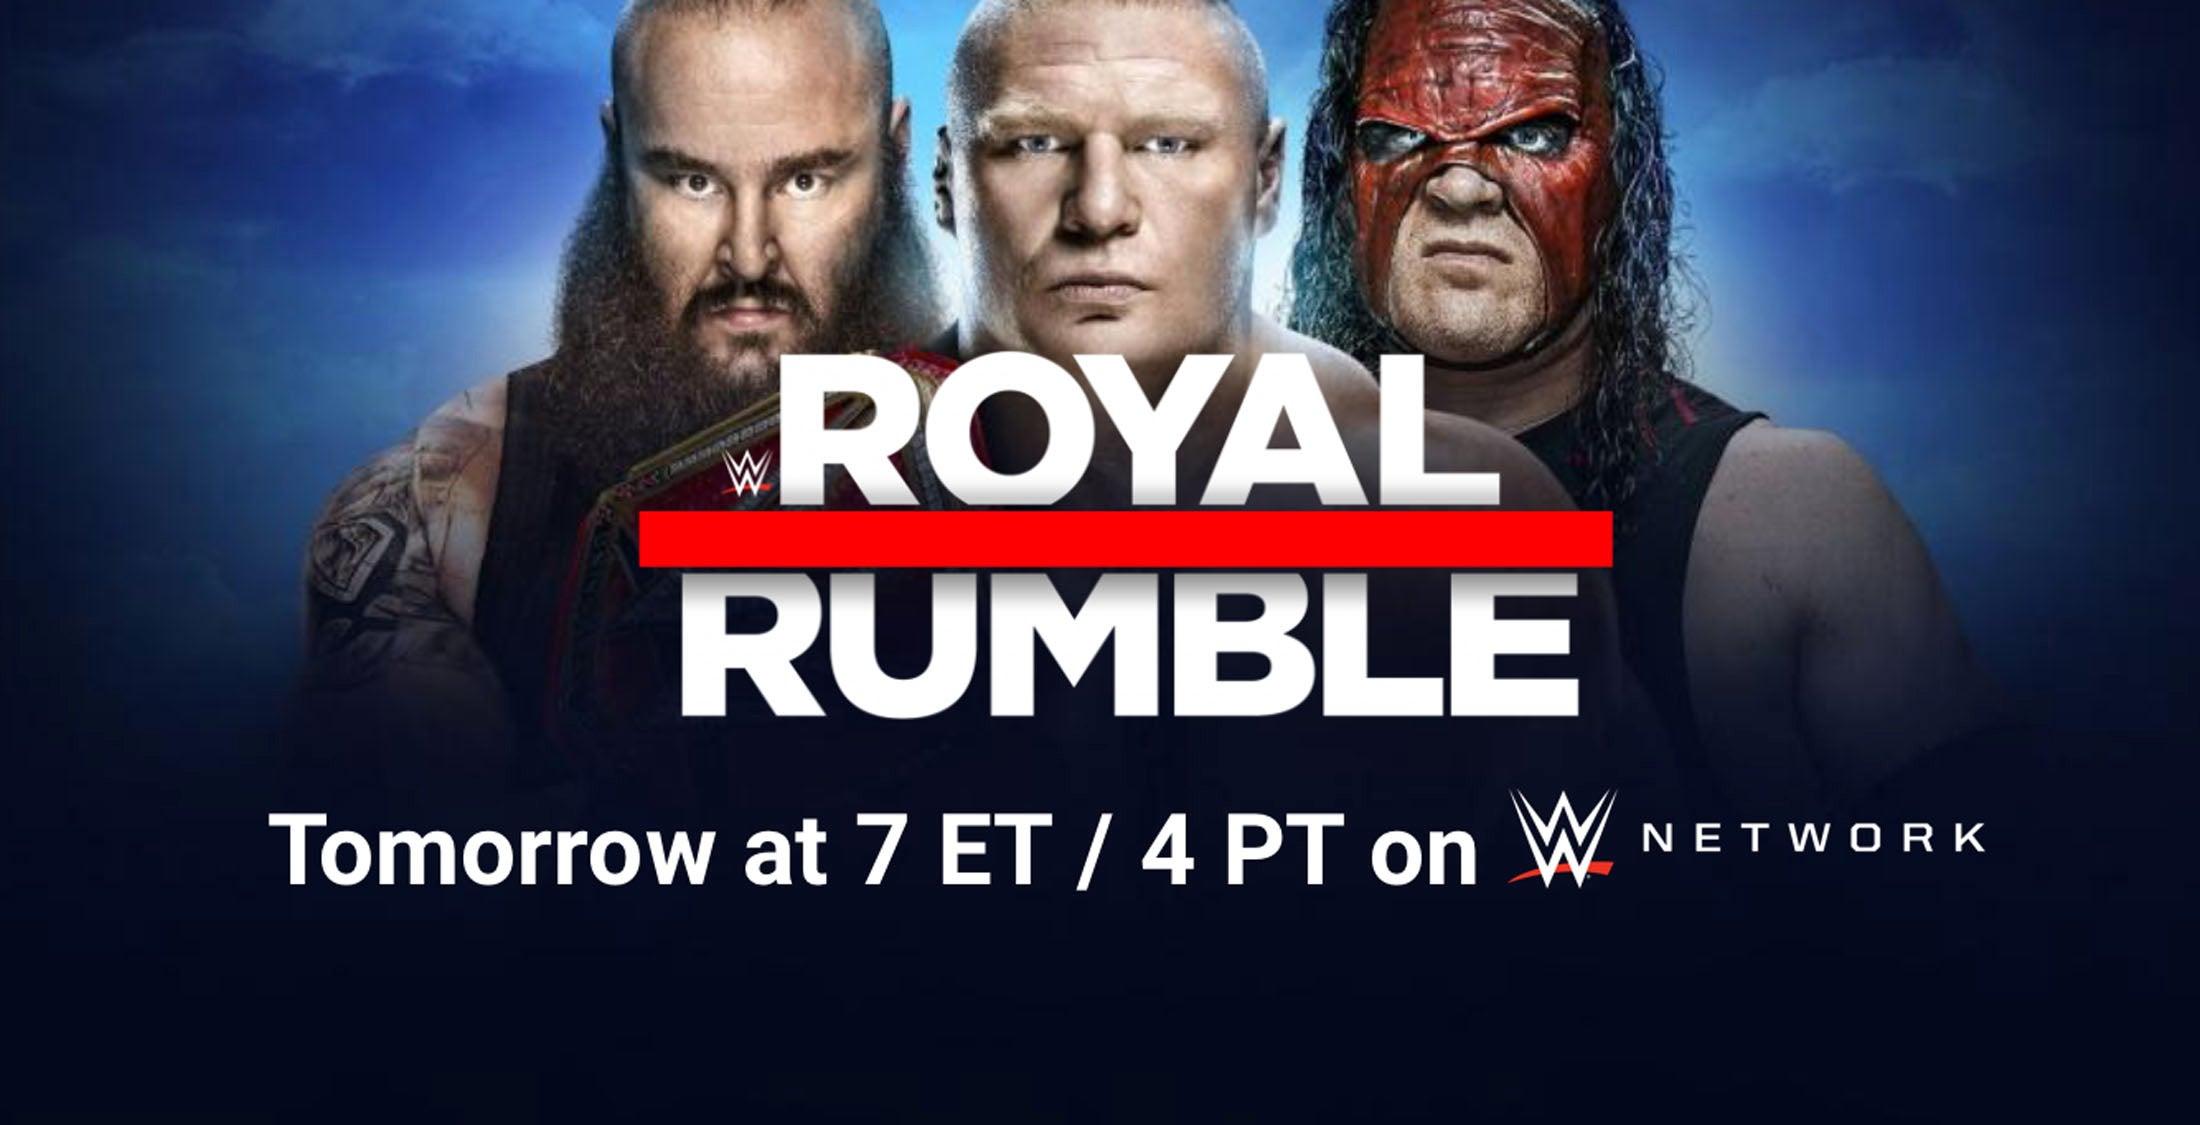 wwe royal rumble 2018 live stream free